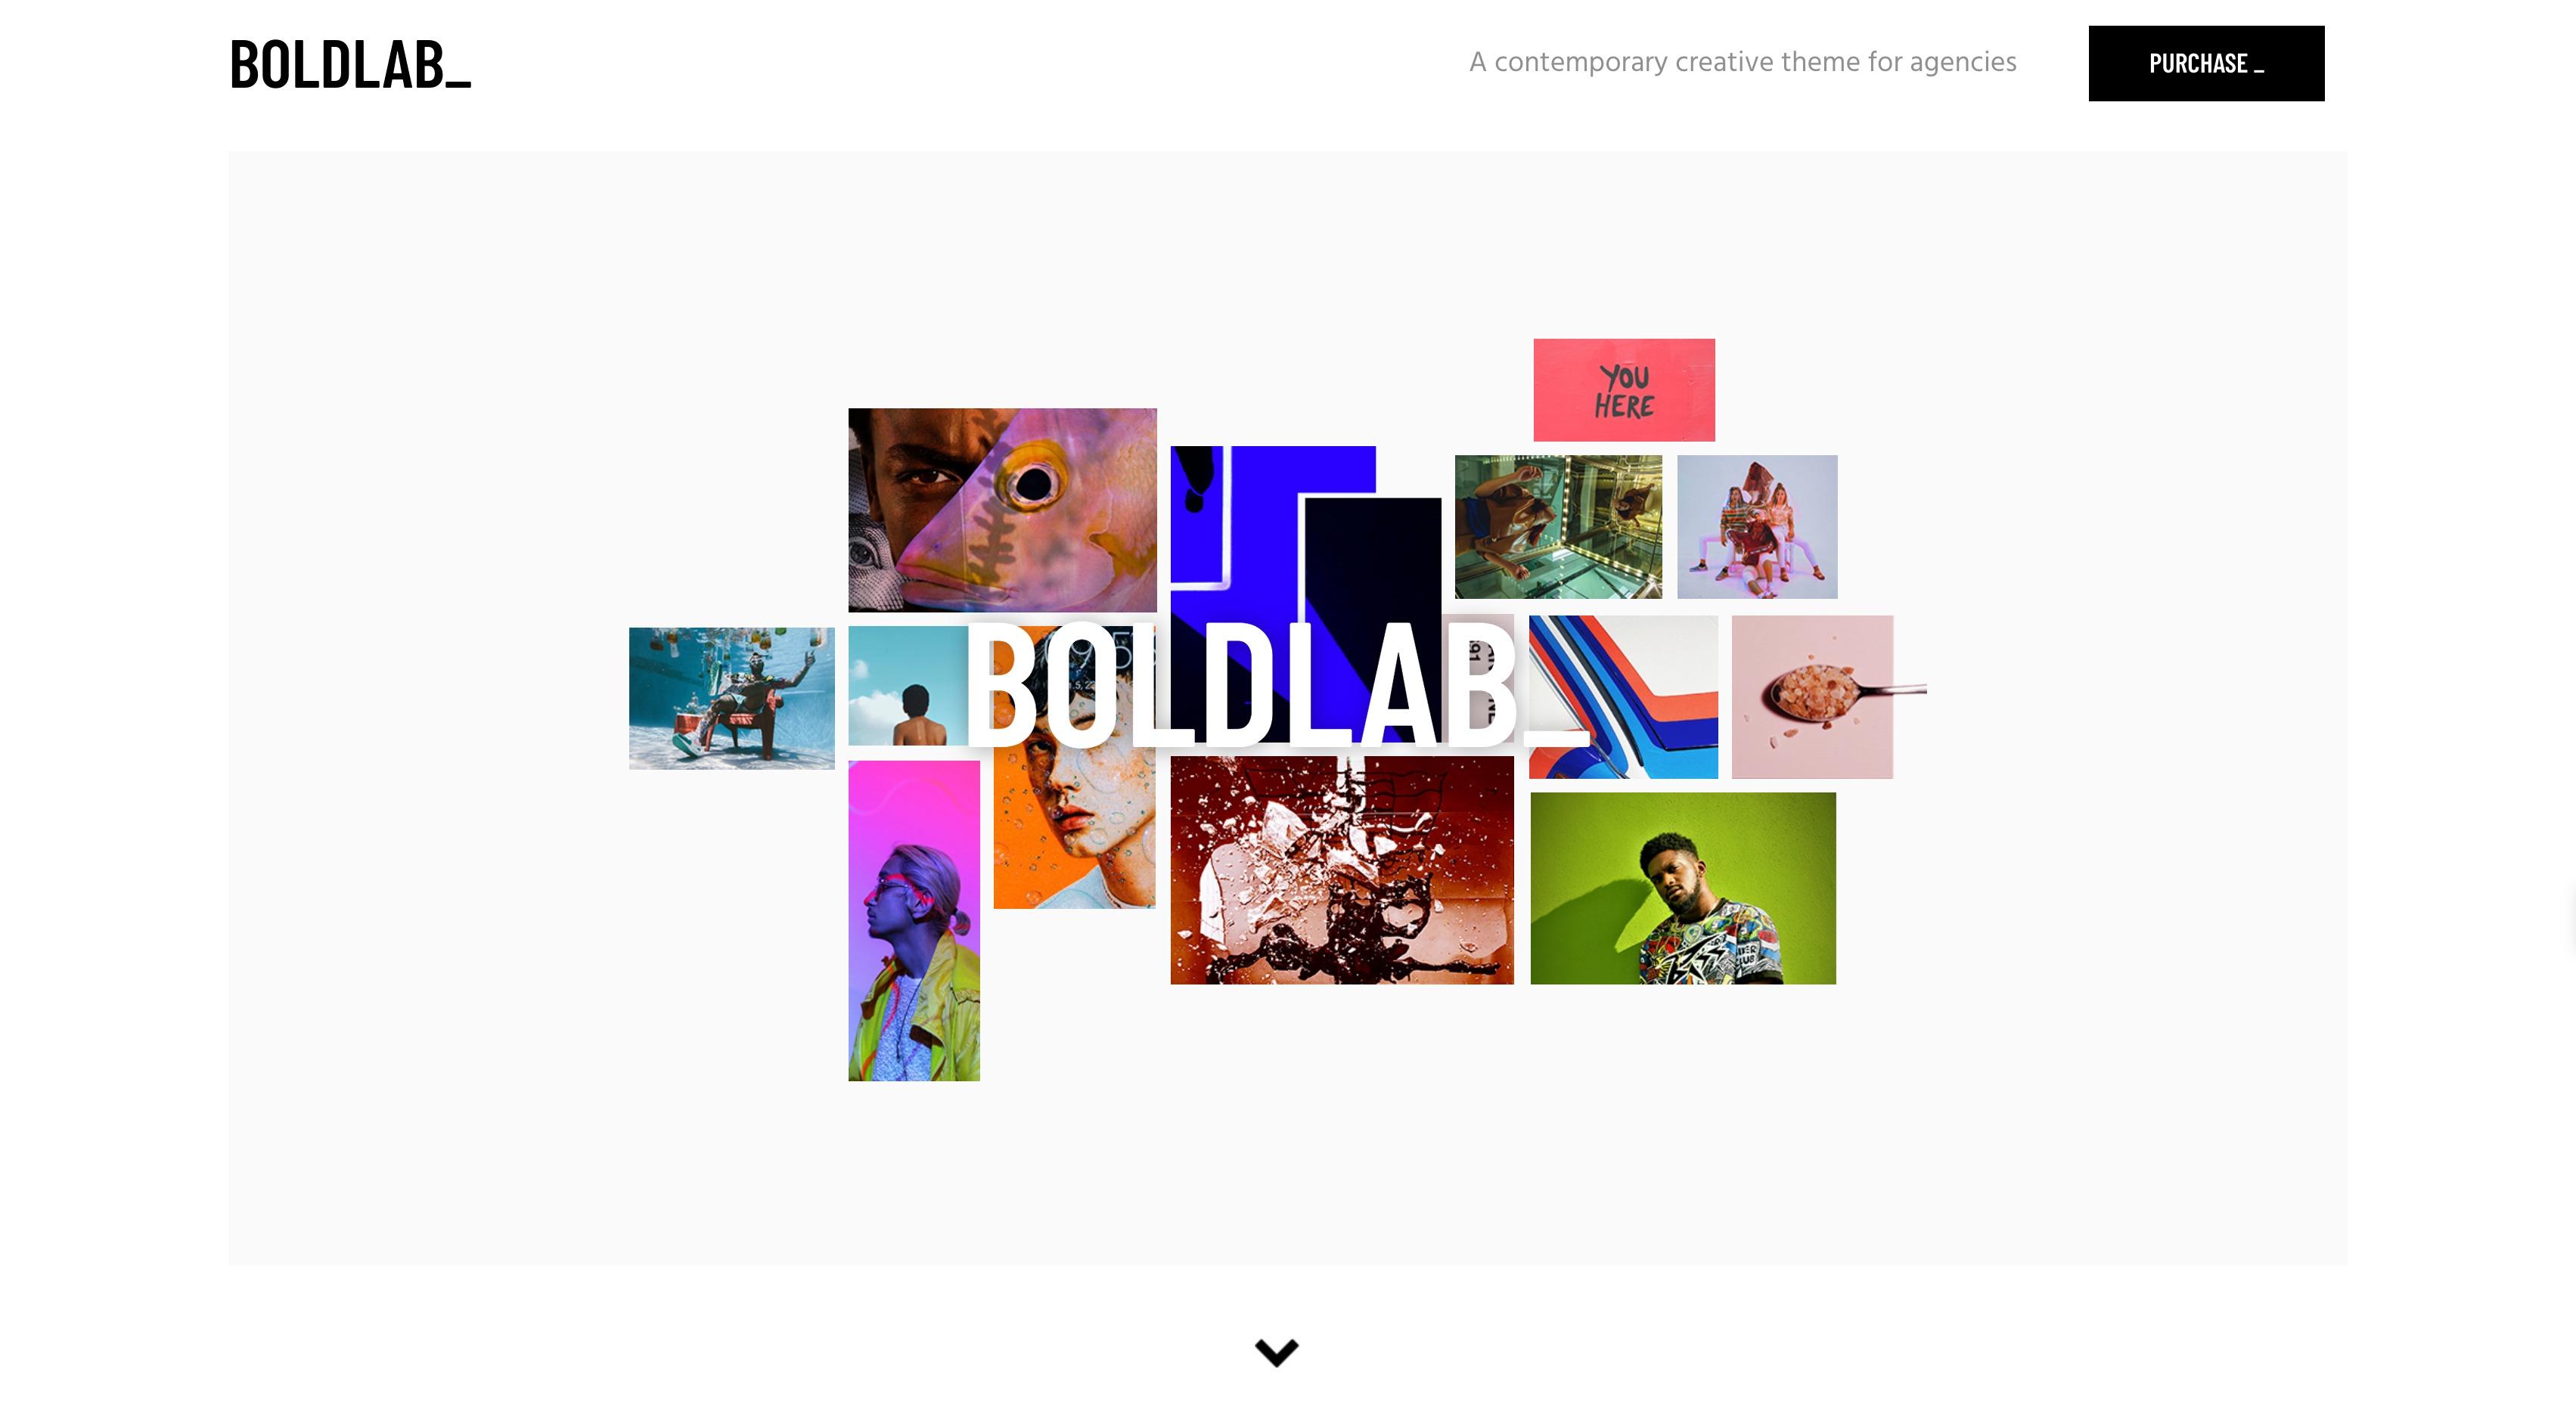 Boldlab-个人作品设计展示WordPress模板